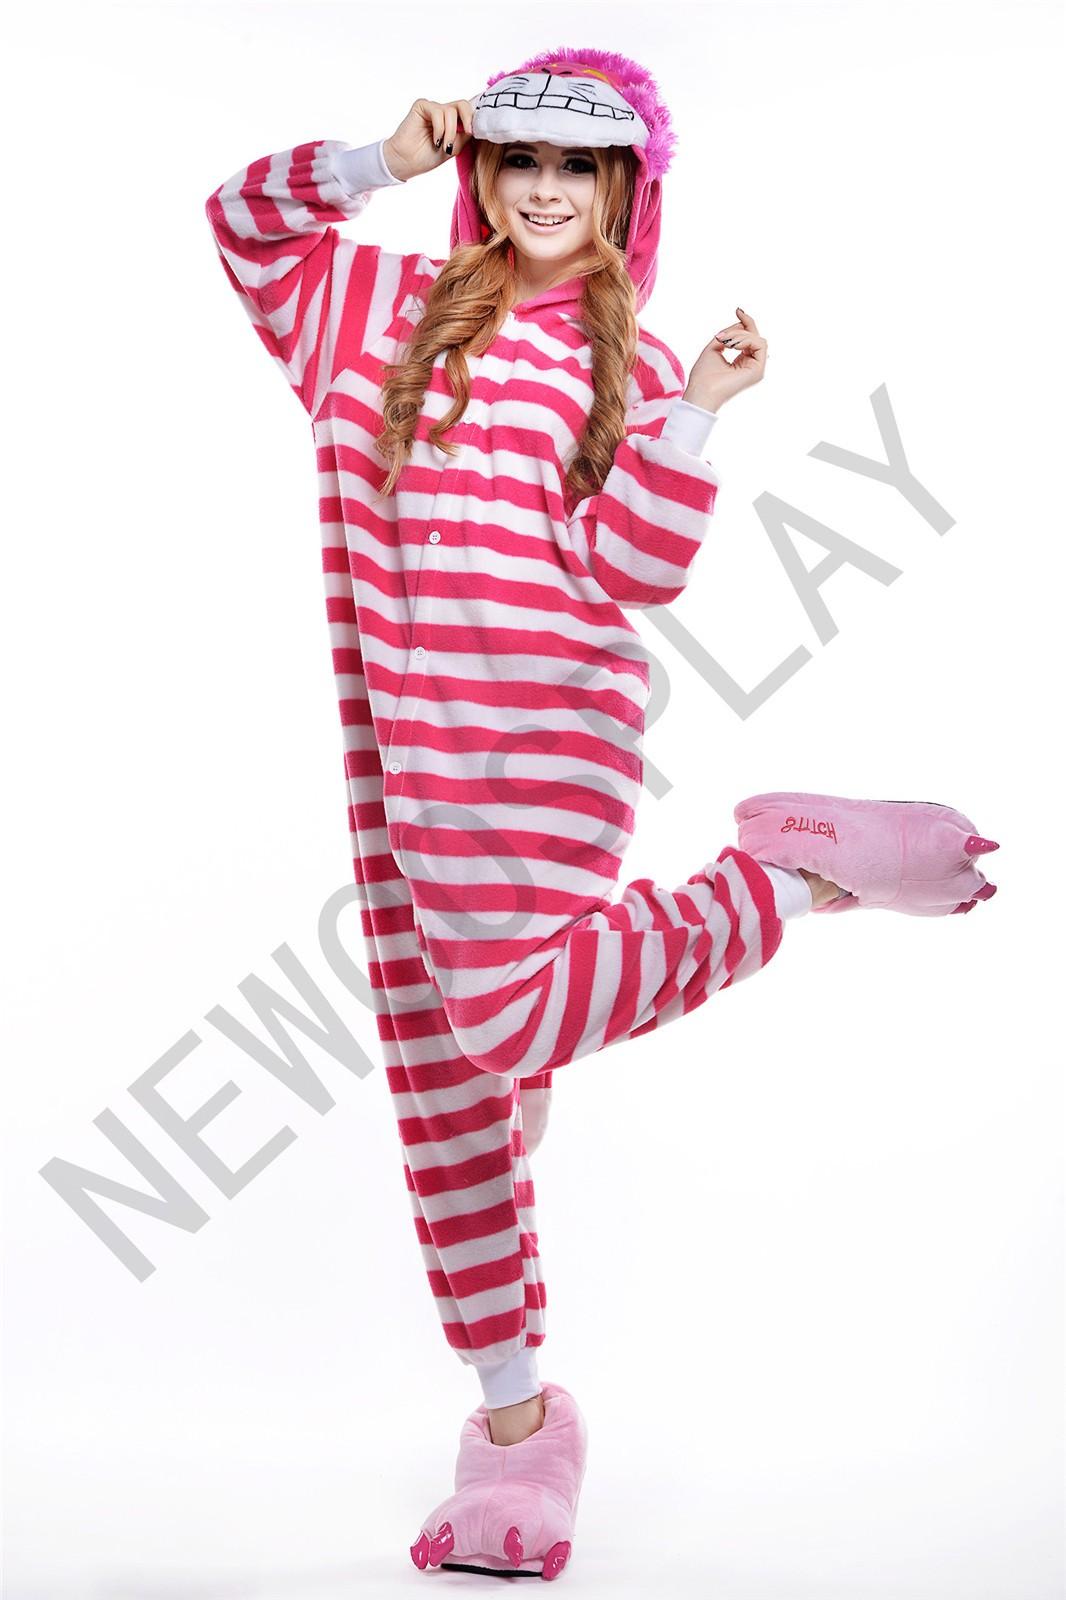 Cheshire cat onesie by newcosplay onesie